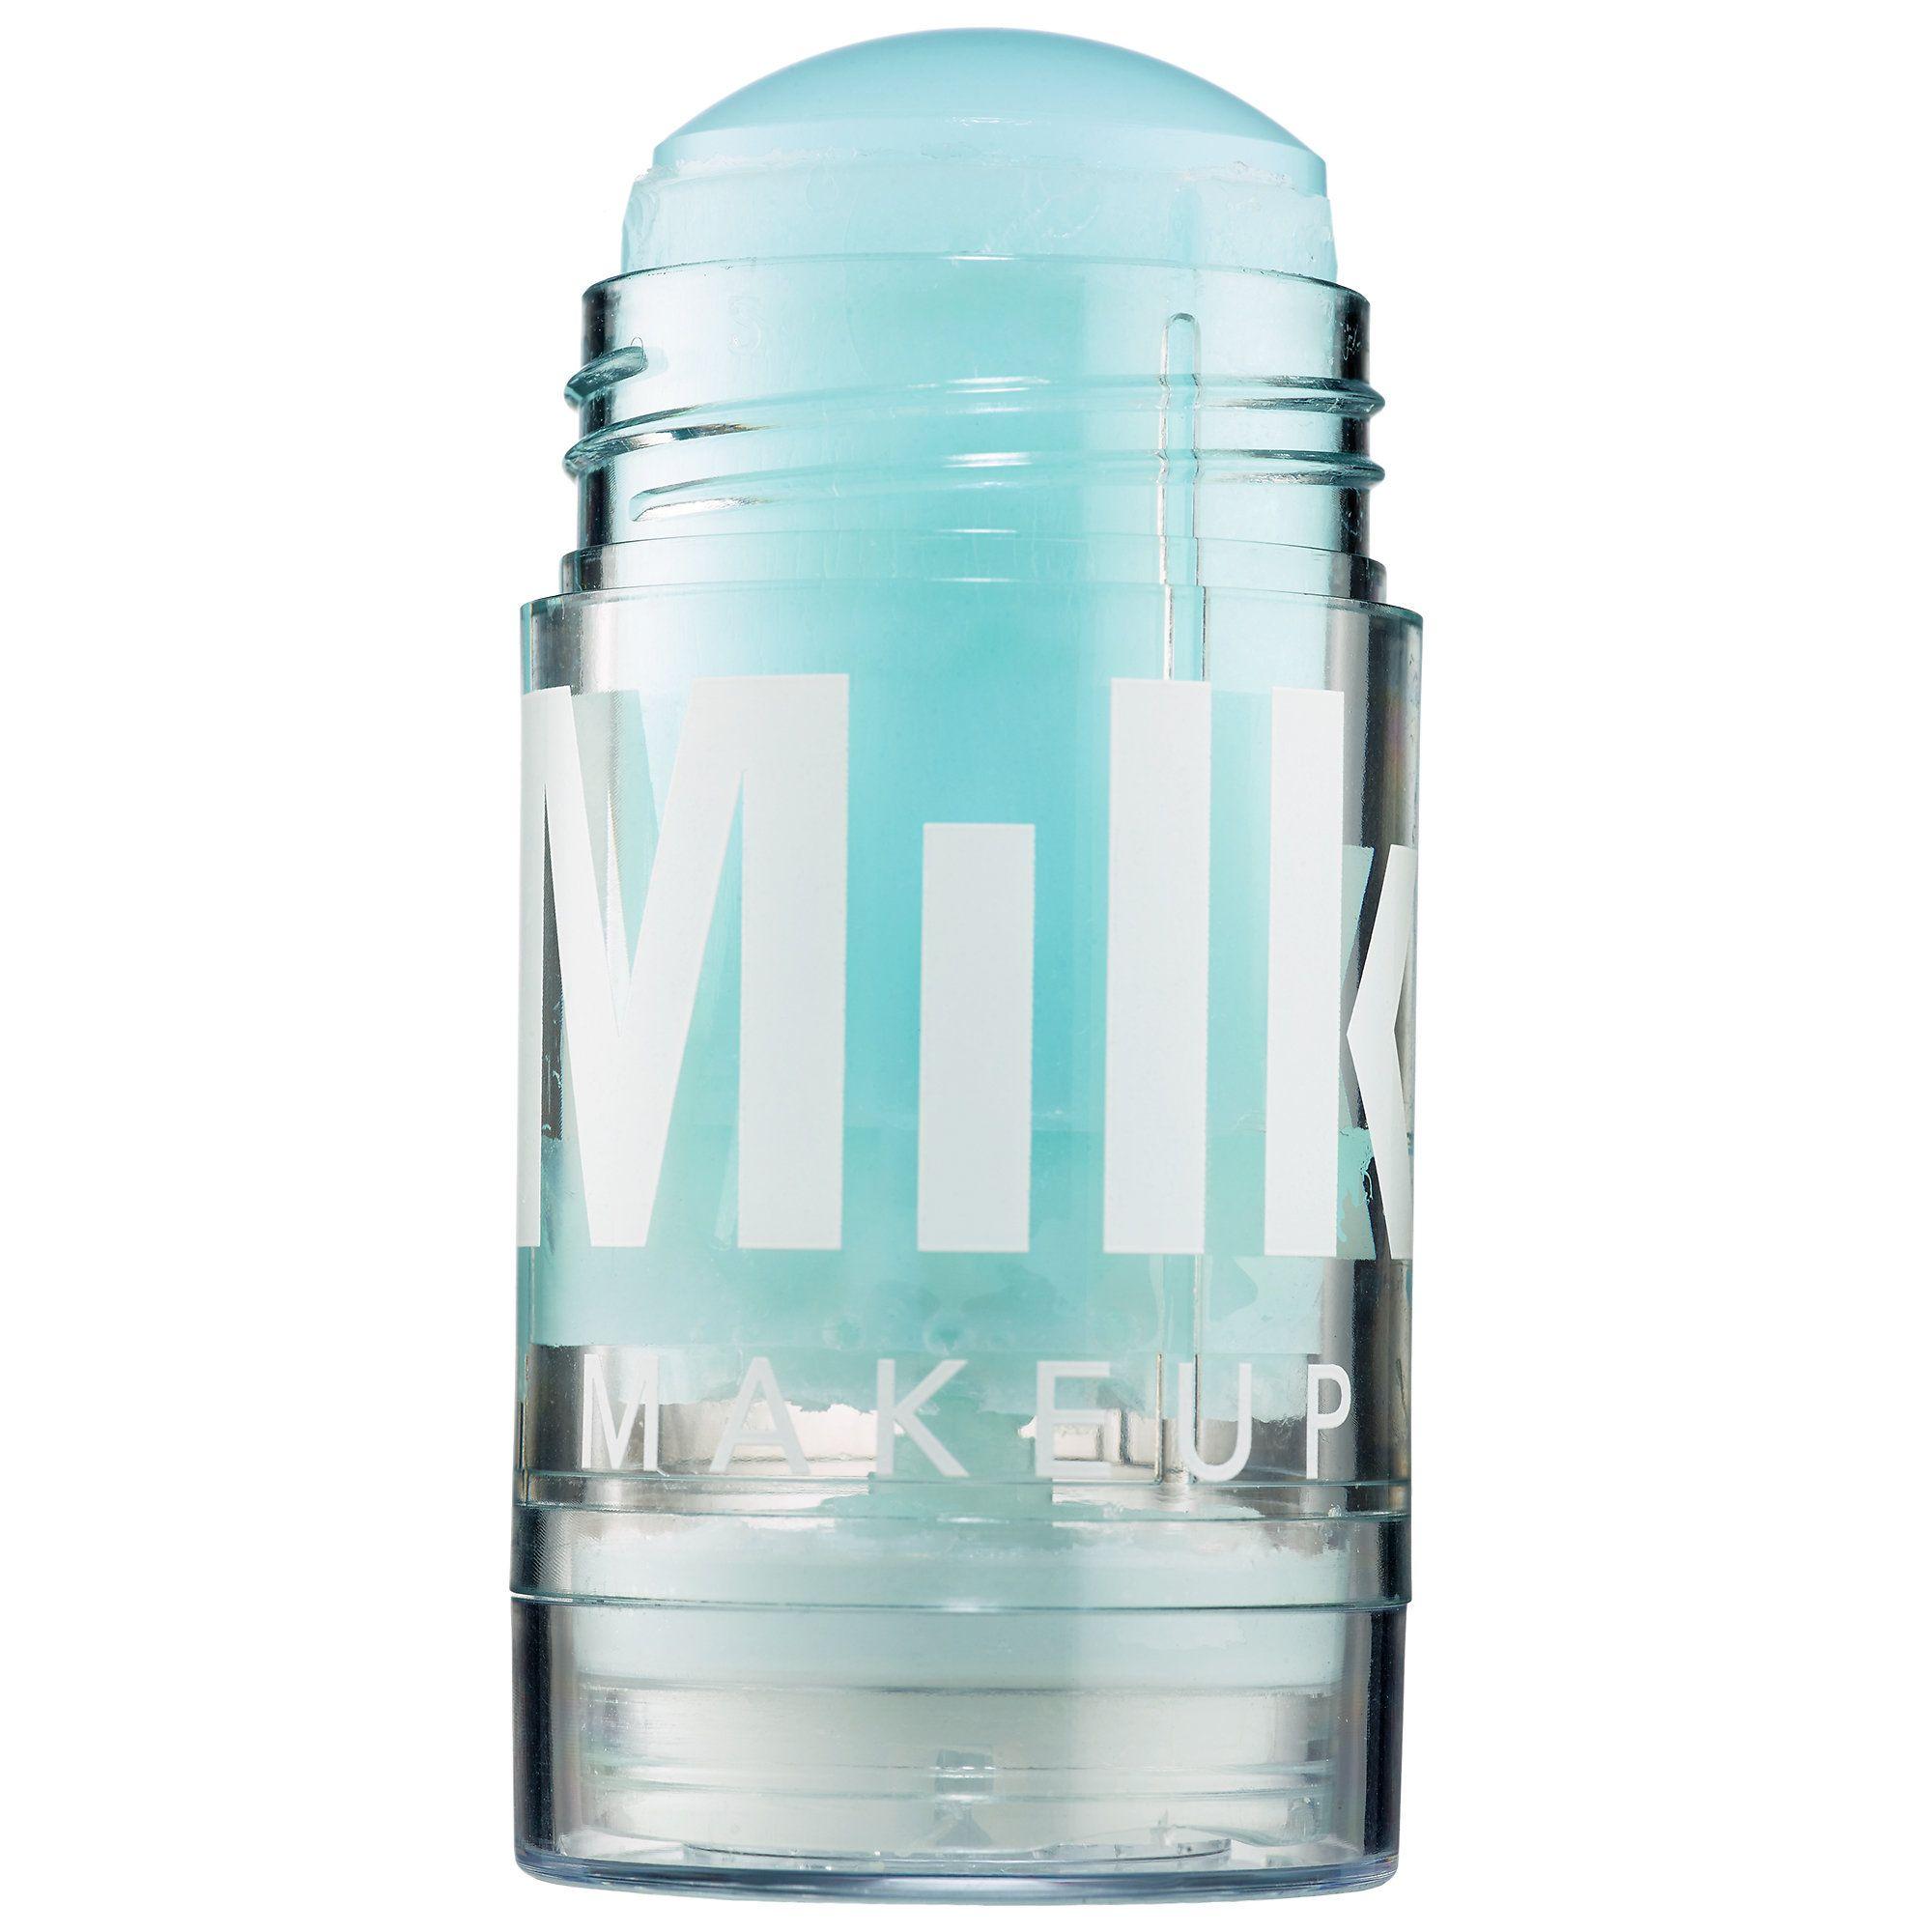 Cooling Water Milk Makeup Sephora Milk Makeup Cooling Water